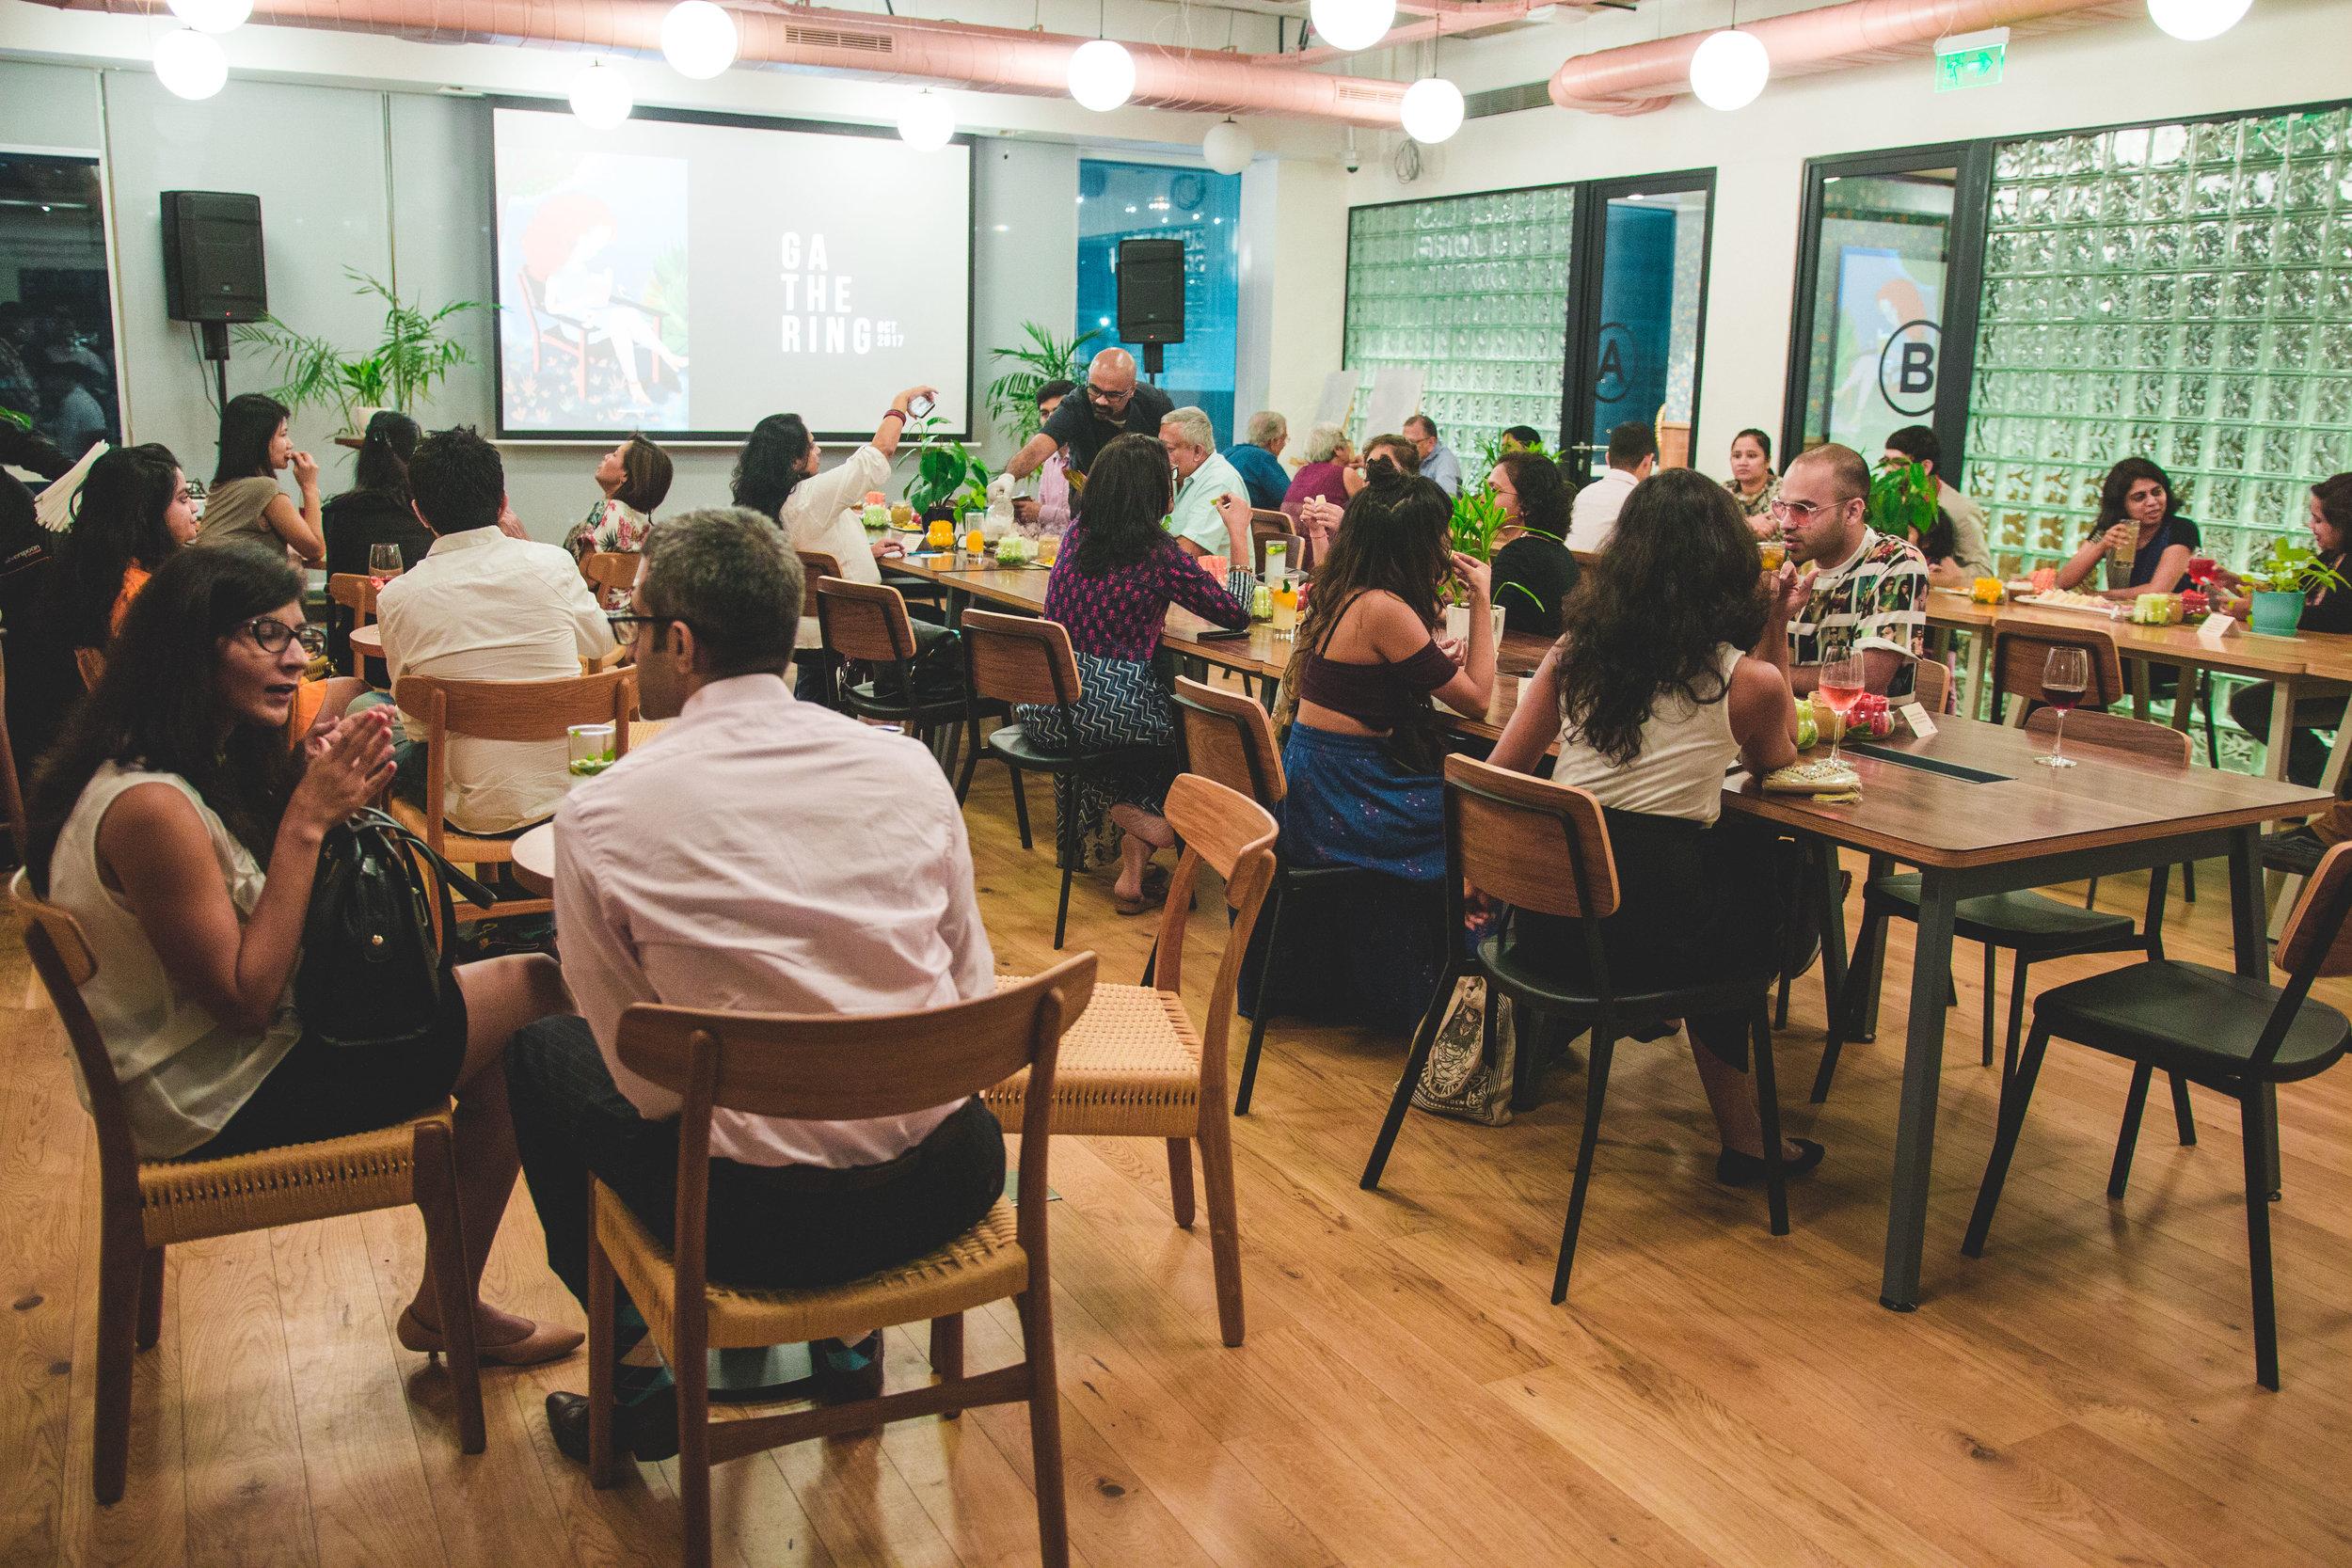 ArtShouldTempt X WeWork Gathering Oct 17 Invitees Image 2